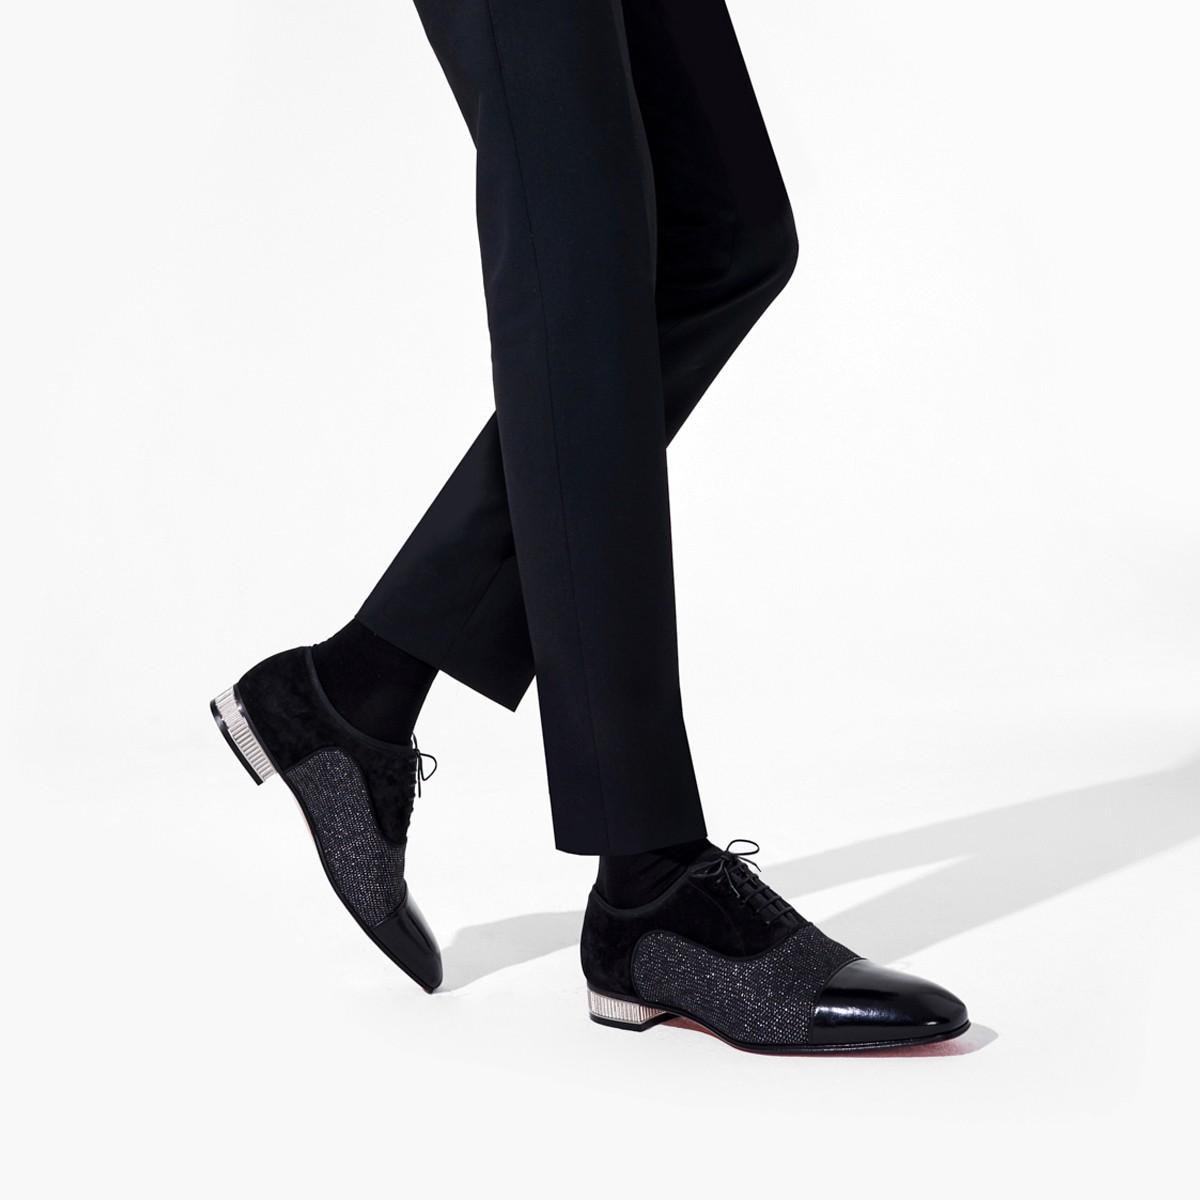 Shoes - Met Greggo - Christian Louboutin